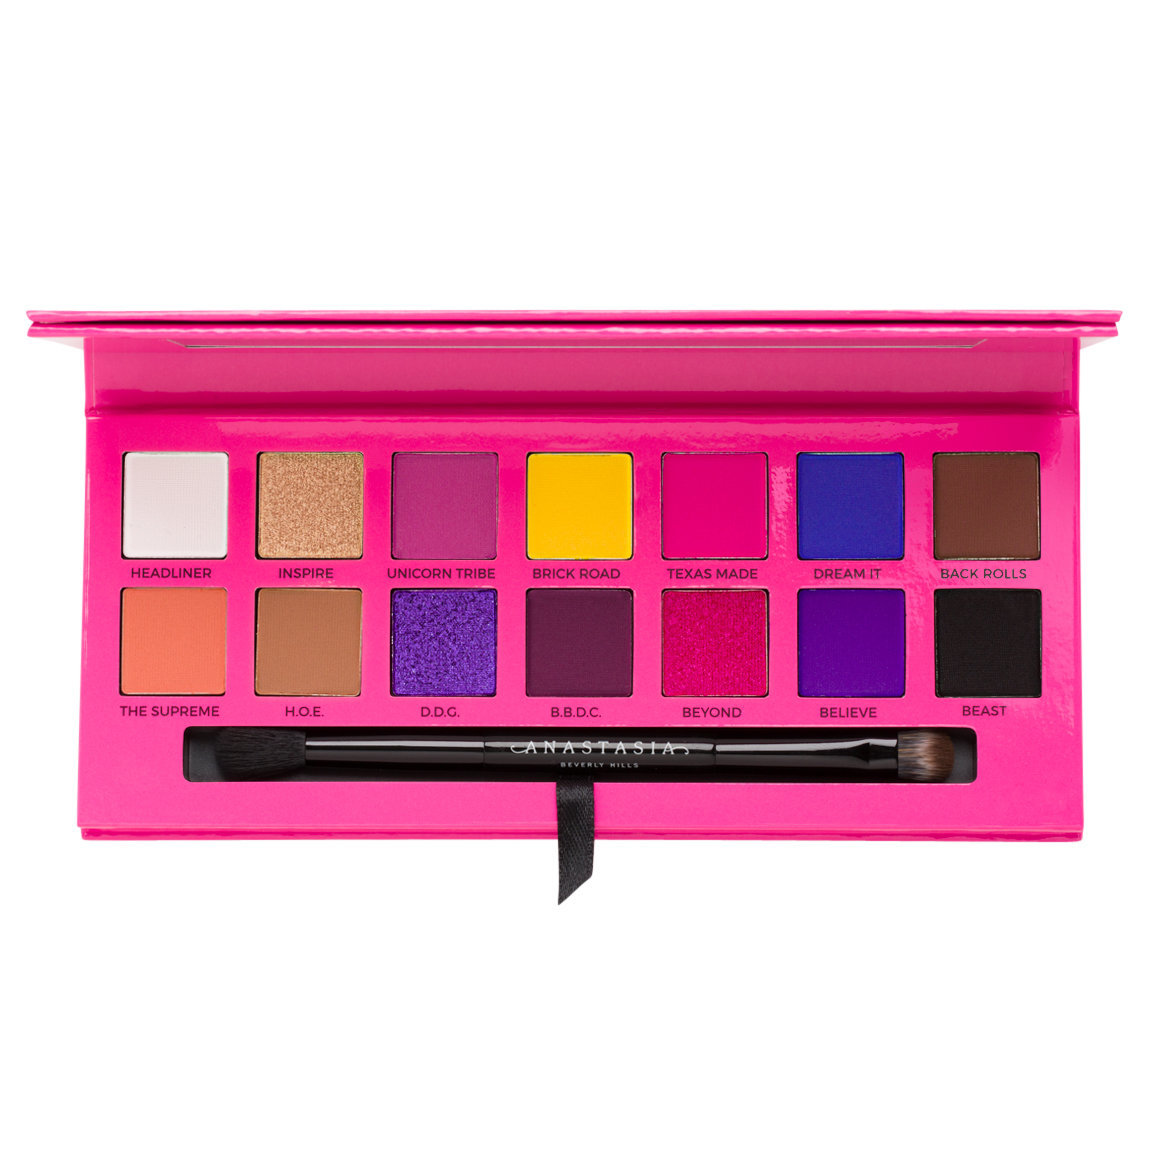 Anastasia Beverly Hills Alyssa Edwards Eye Shadow Palette alternative view 1 - product swatch.